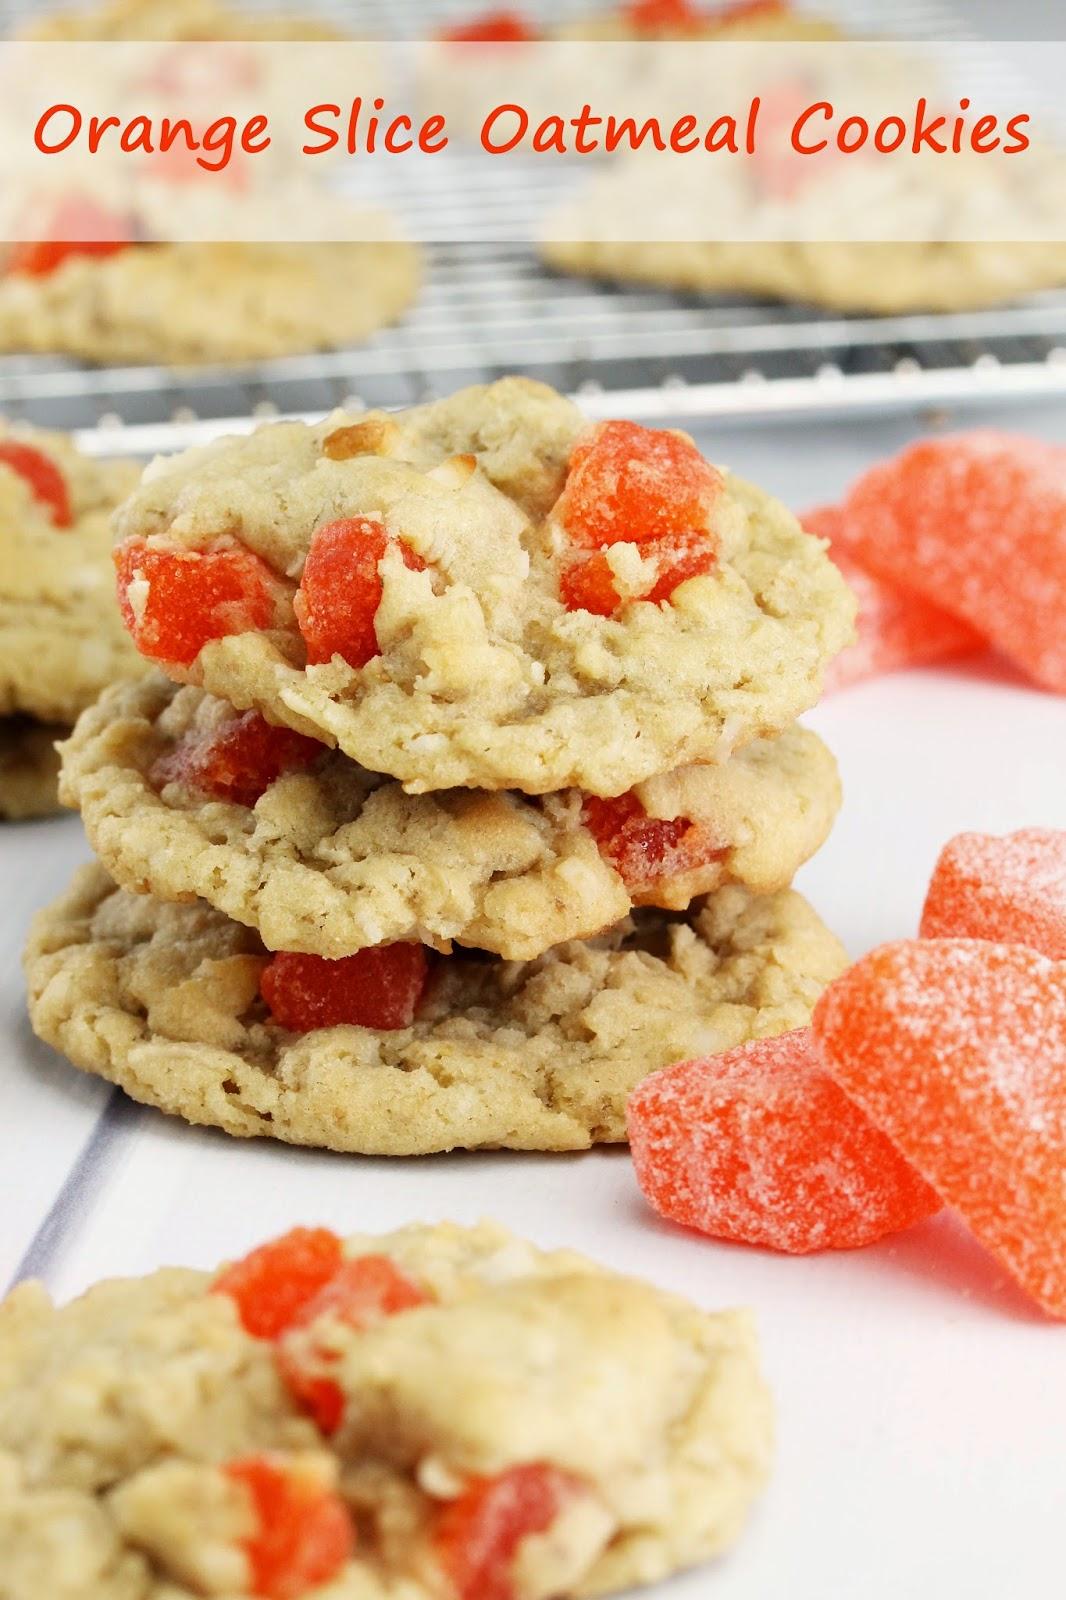 old fashioned orange slice oatmeal cookies